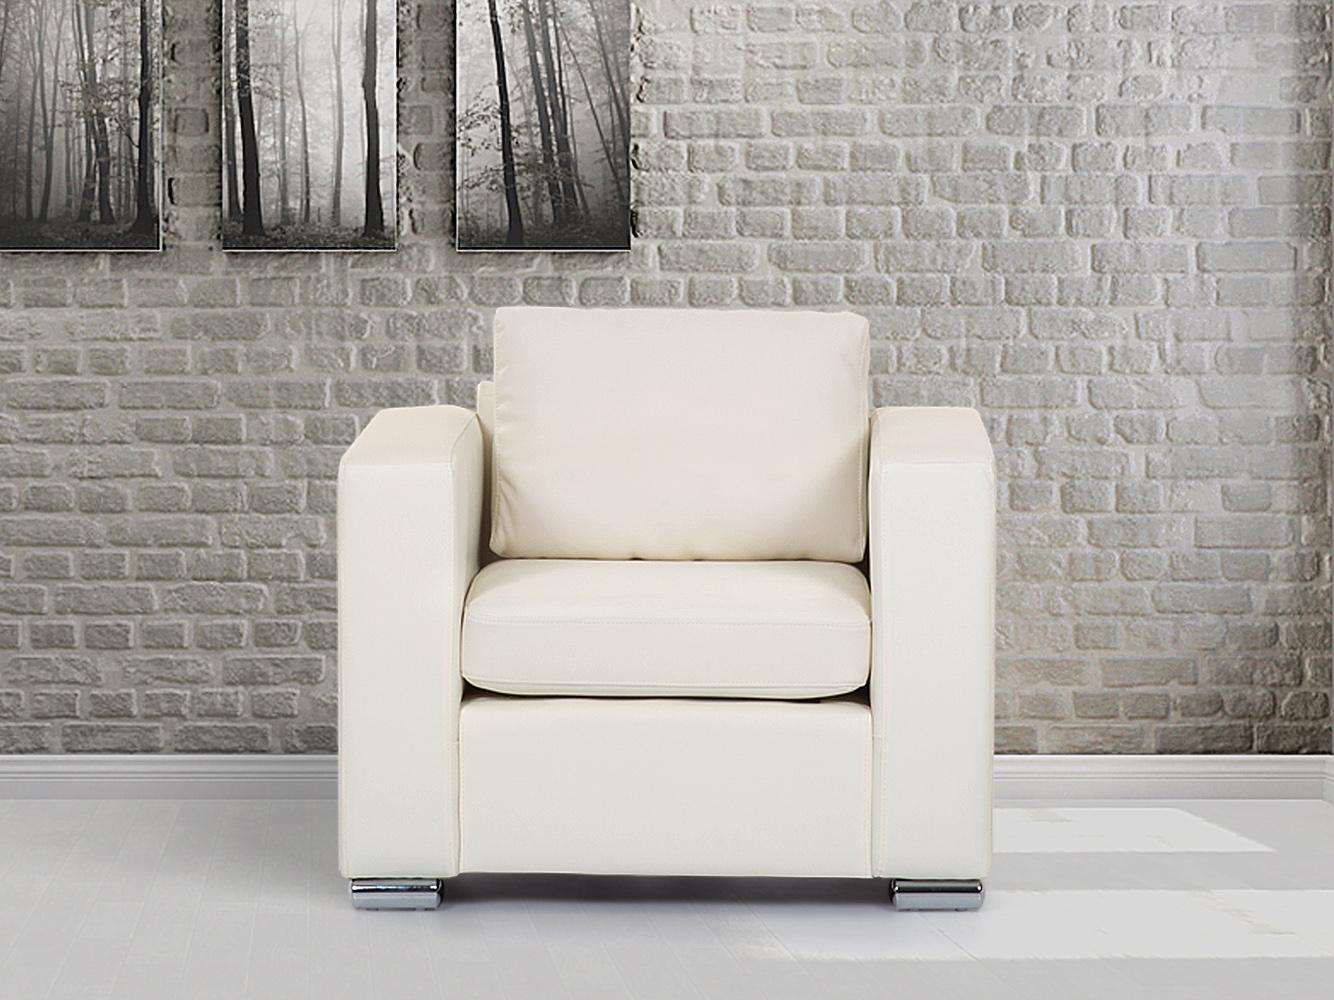 sessel beige ohrensessel relaxsessel clubsessel armlehnstuhl echtleder ebay. Black Bedroom Furniture Sets. Home Design Ideas